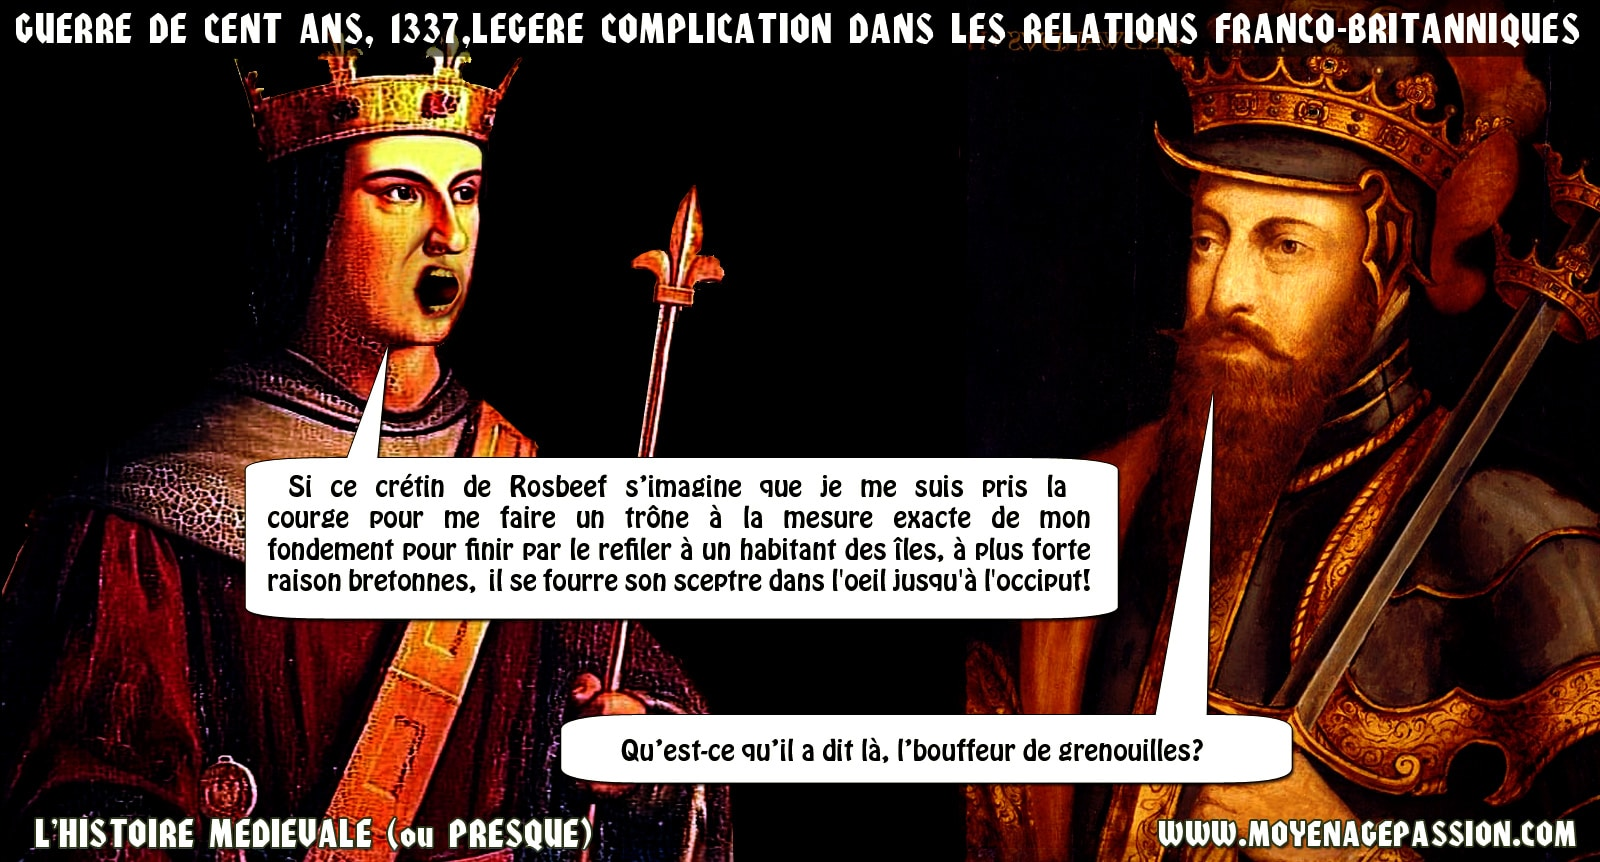 humour_histoire_medieval_guerre_cent_ans_philippe_de_valois_edouard_III_moyen-age_passion